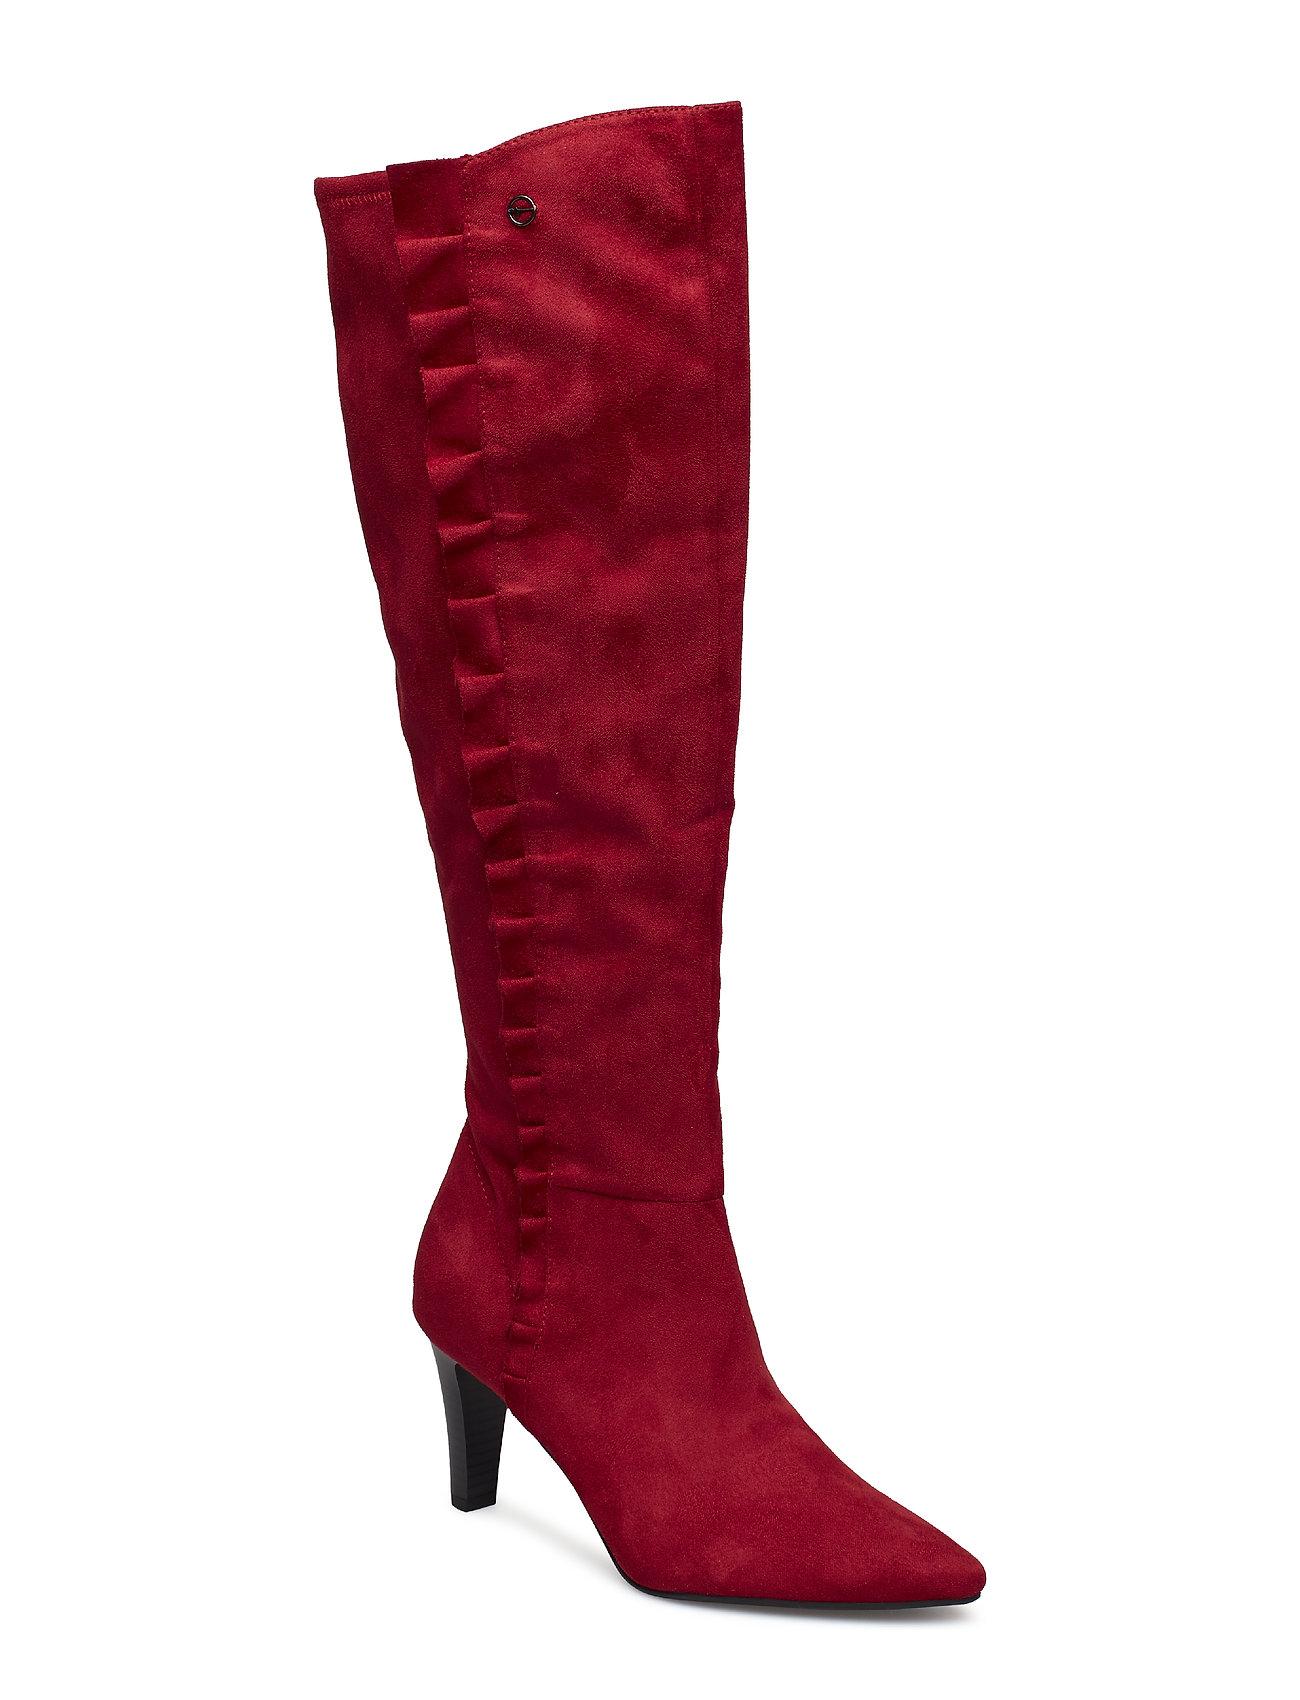 Tamaris Woms Boots - LIPSTICK